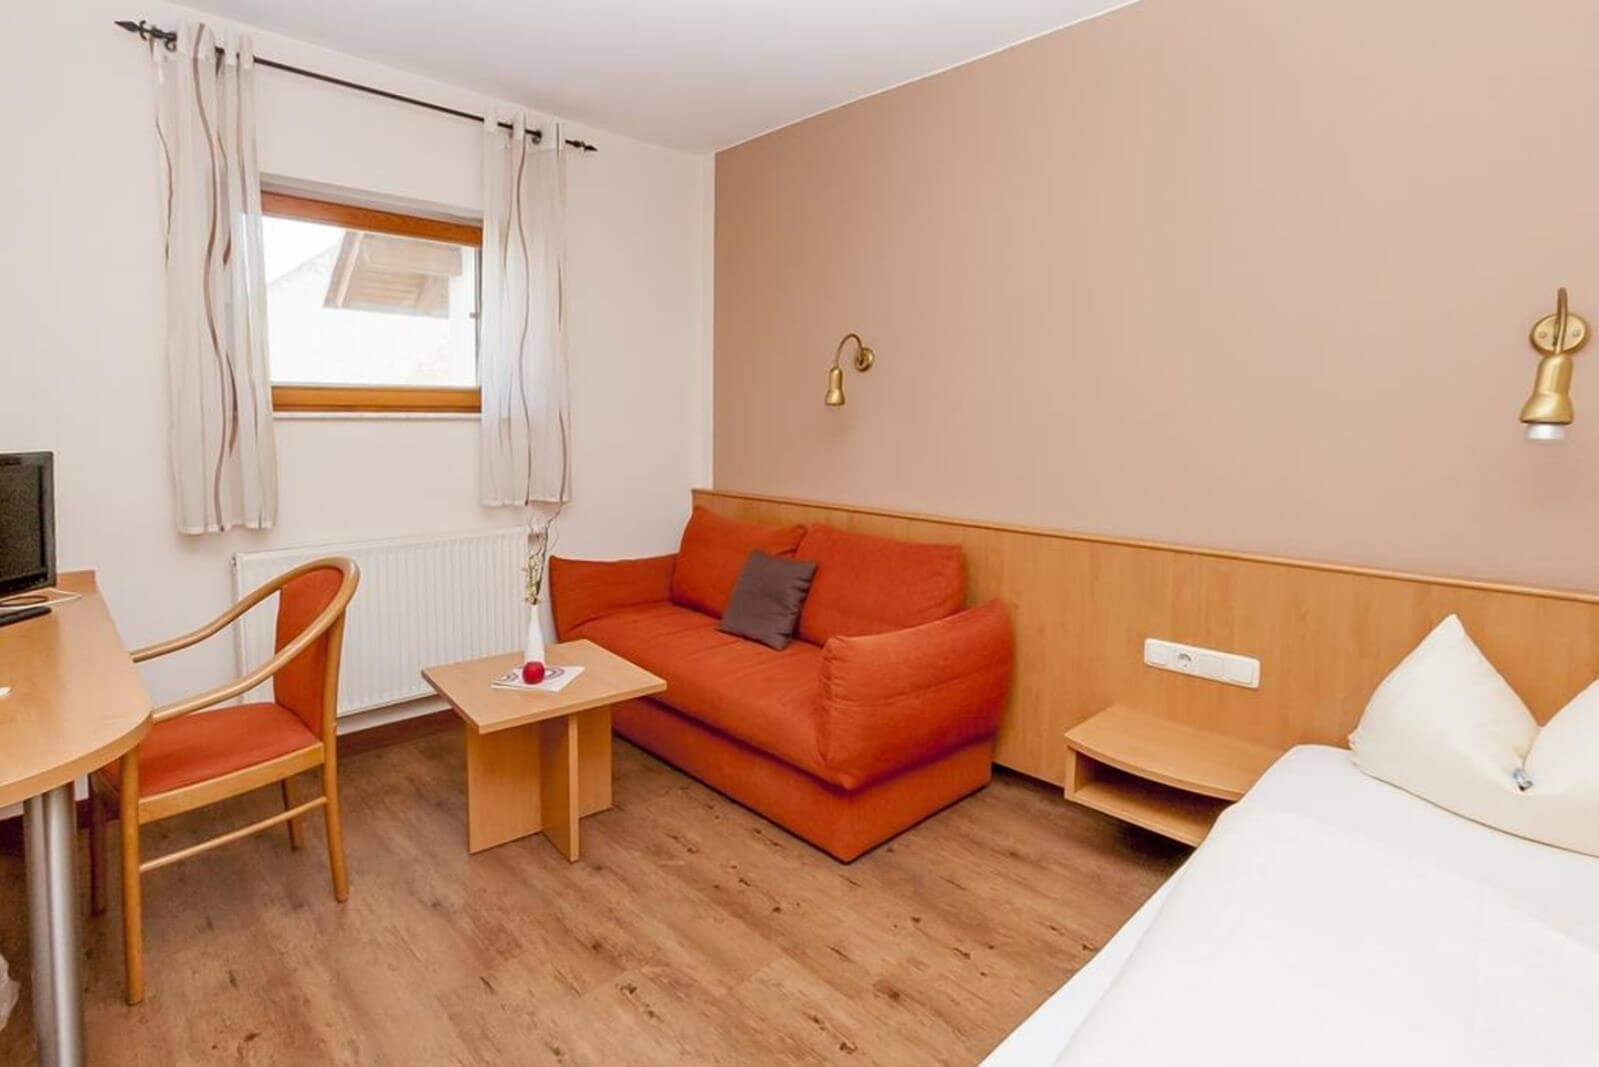 einzelzimmer-standard-hotel-pension-bett-fruehstueck-riedstadt5